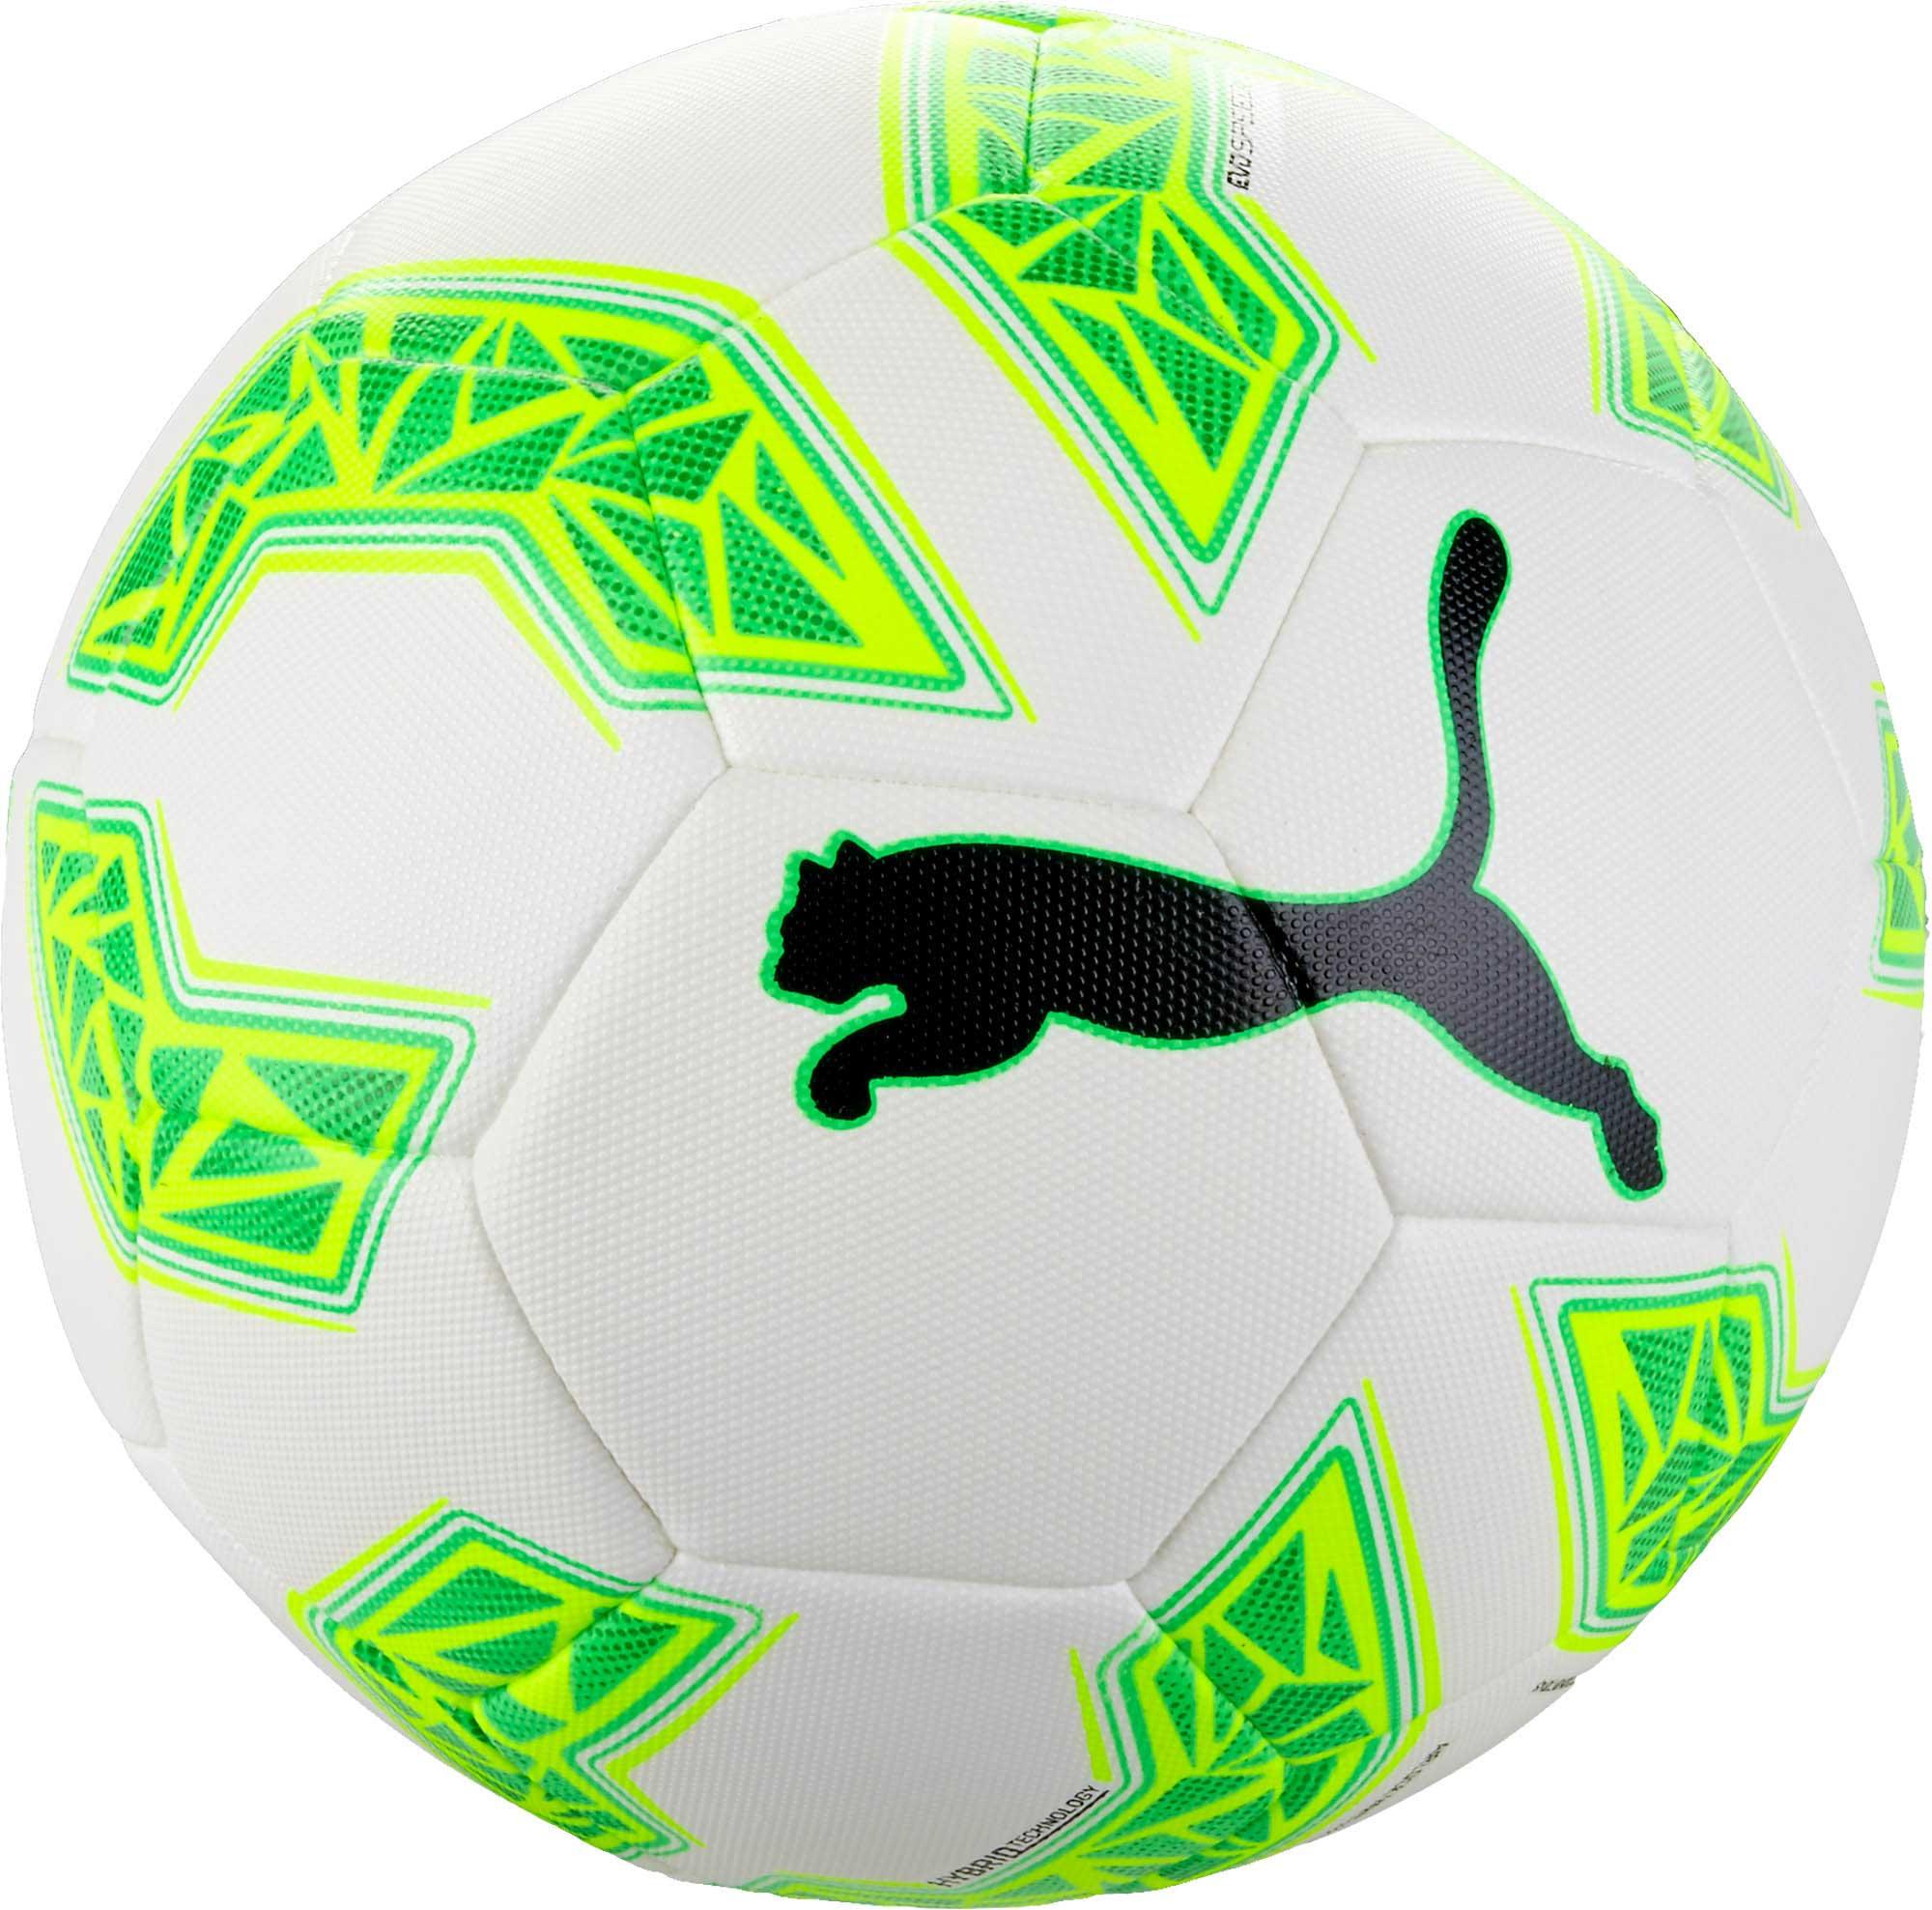 Puma evoSPEED 2.5 Hybrid Soccer Ball - White   Green Gecko ... 426d7babe